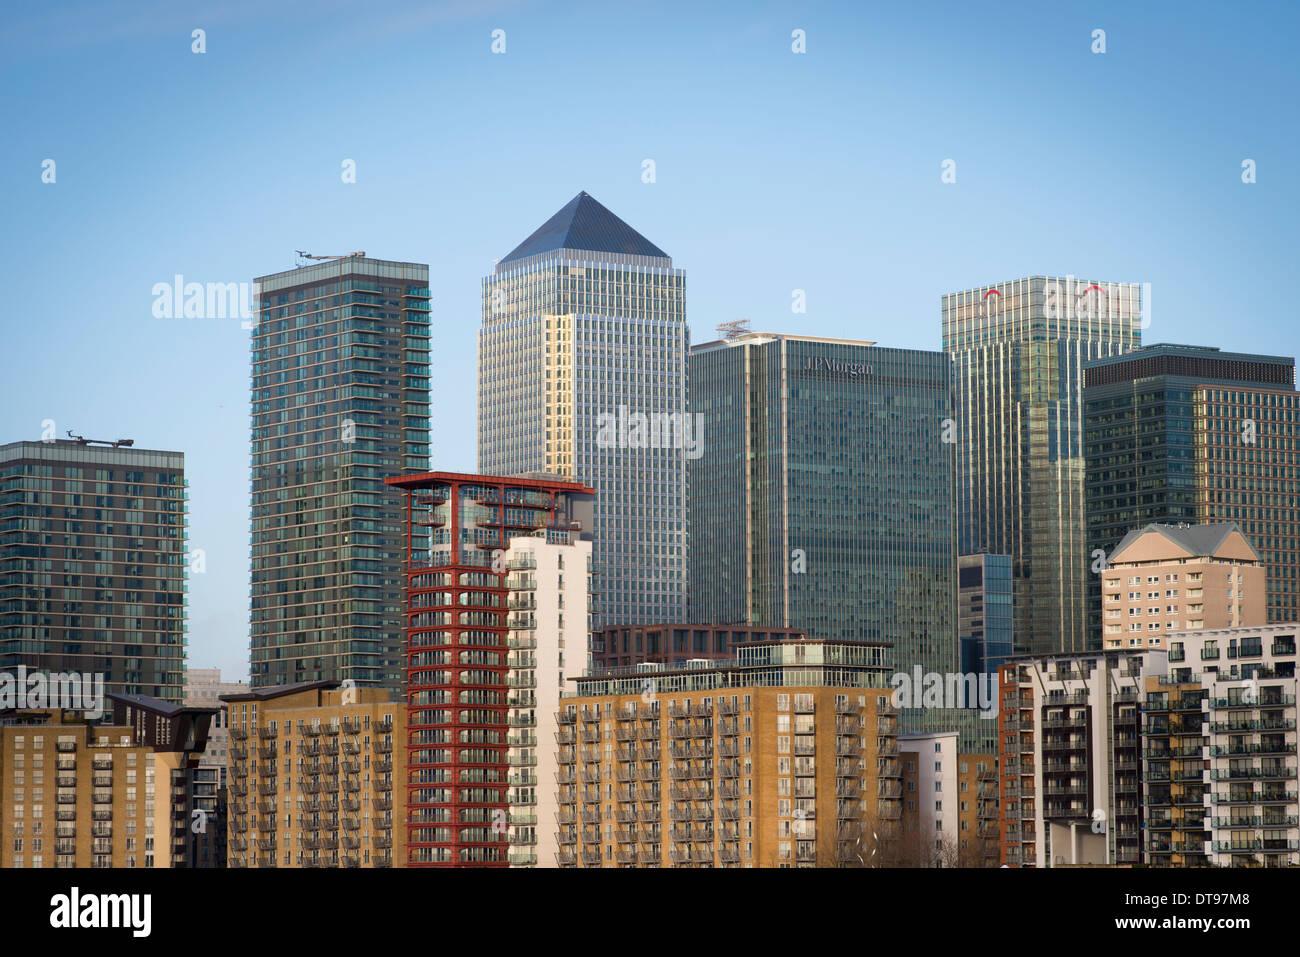 Canary Wharf, Isle of Dogs, London. - Stock Image